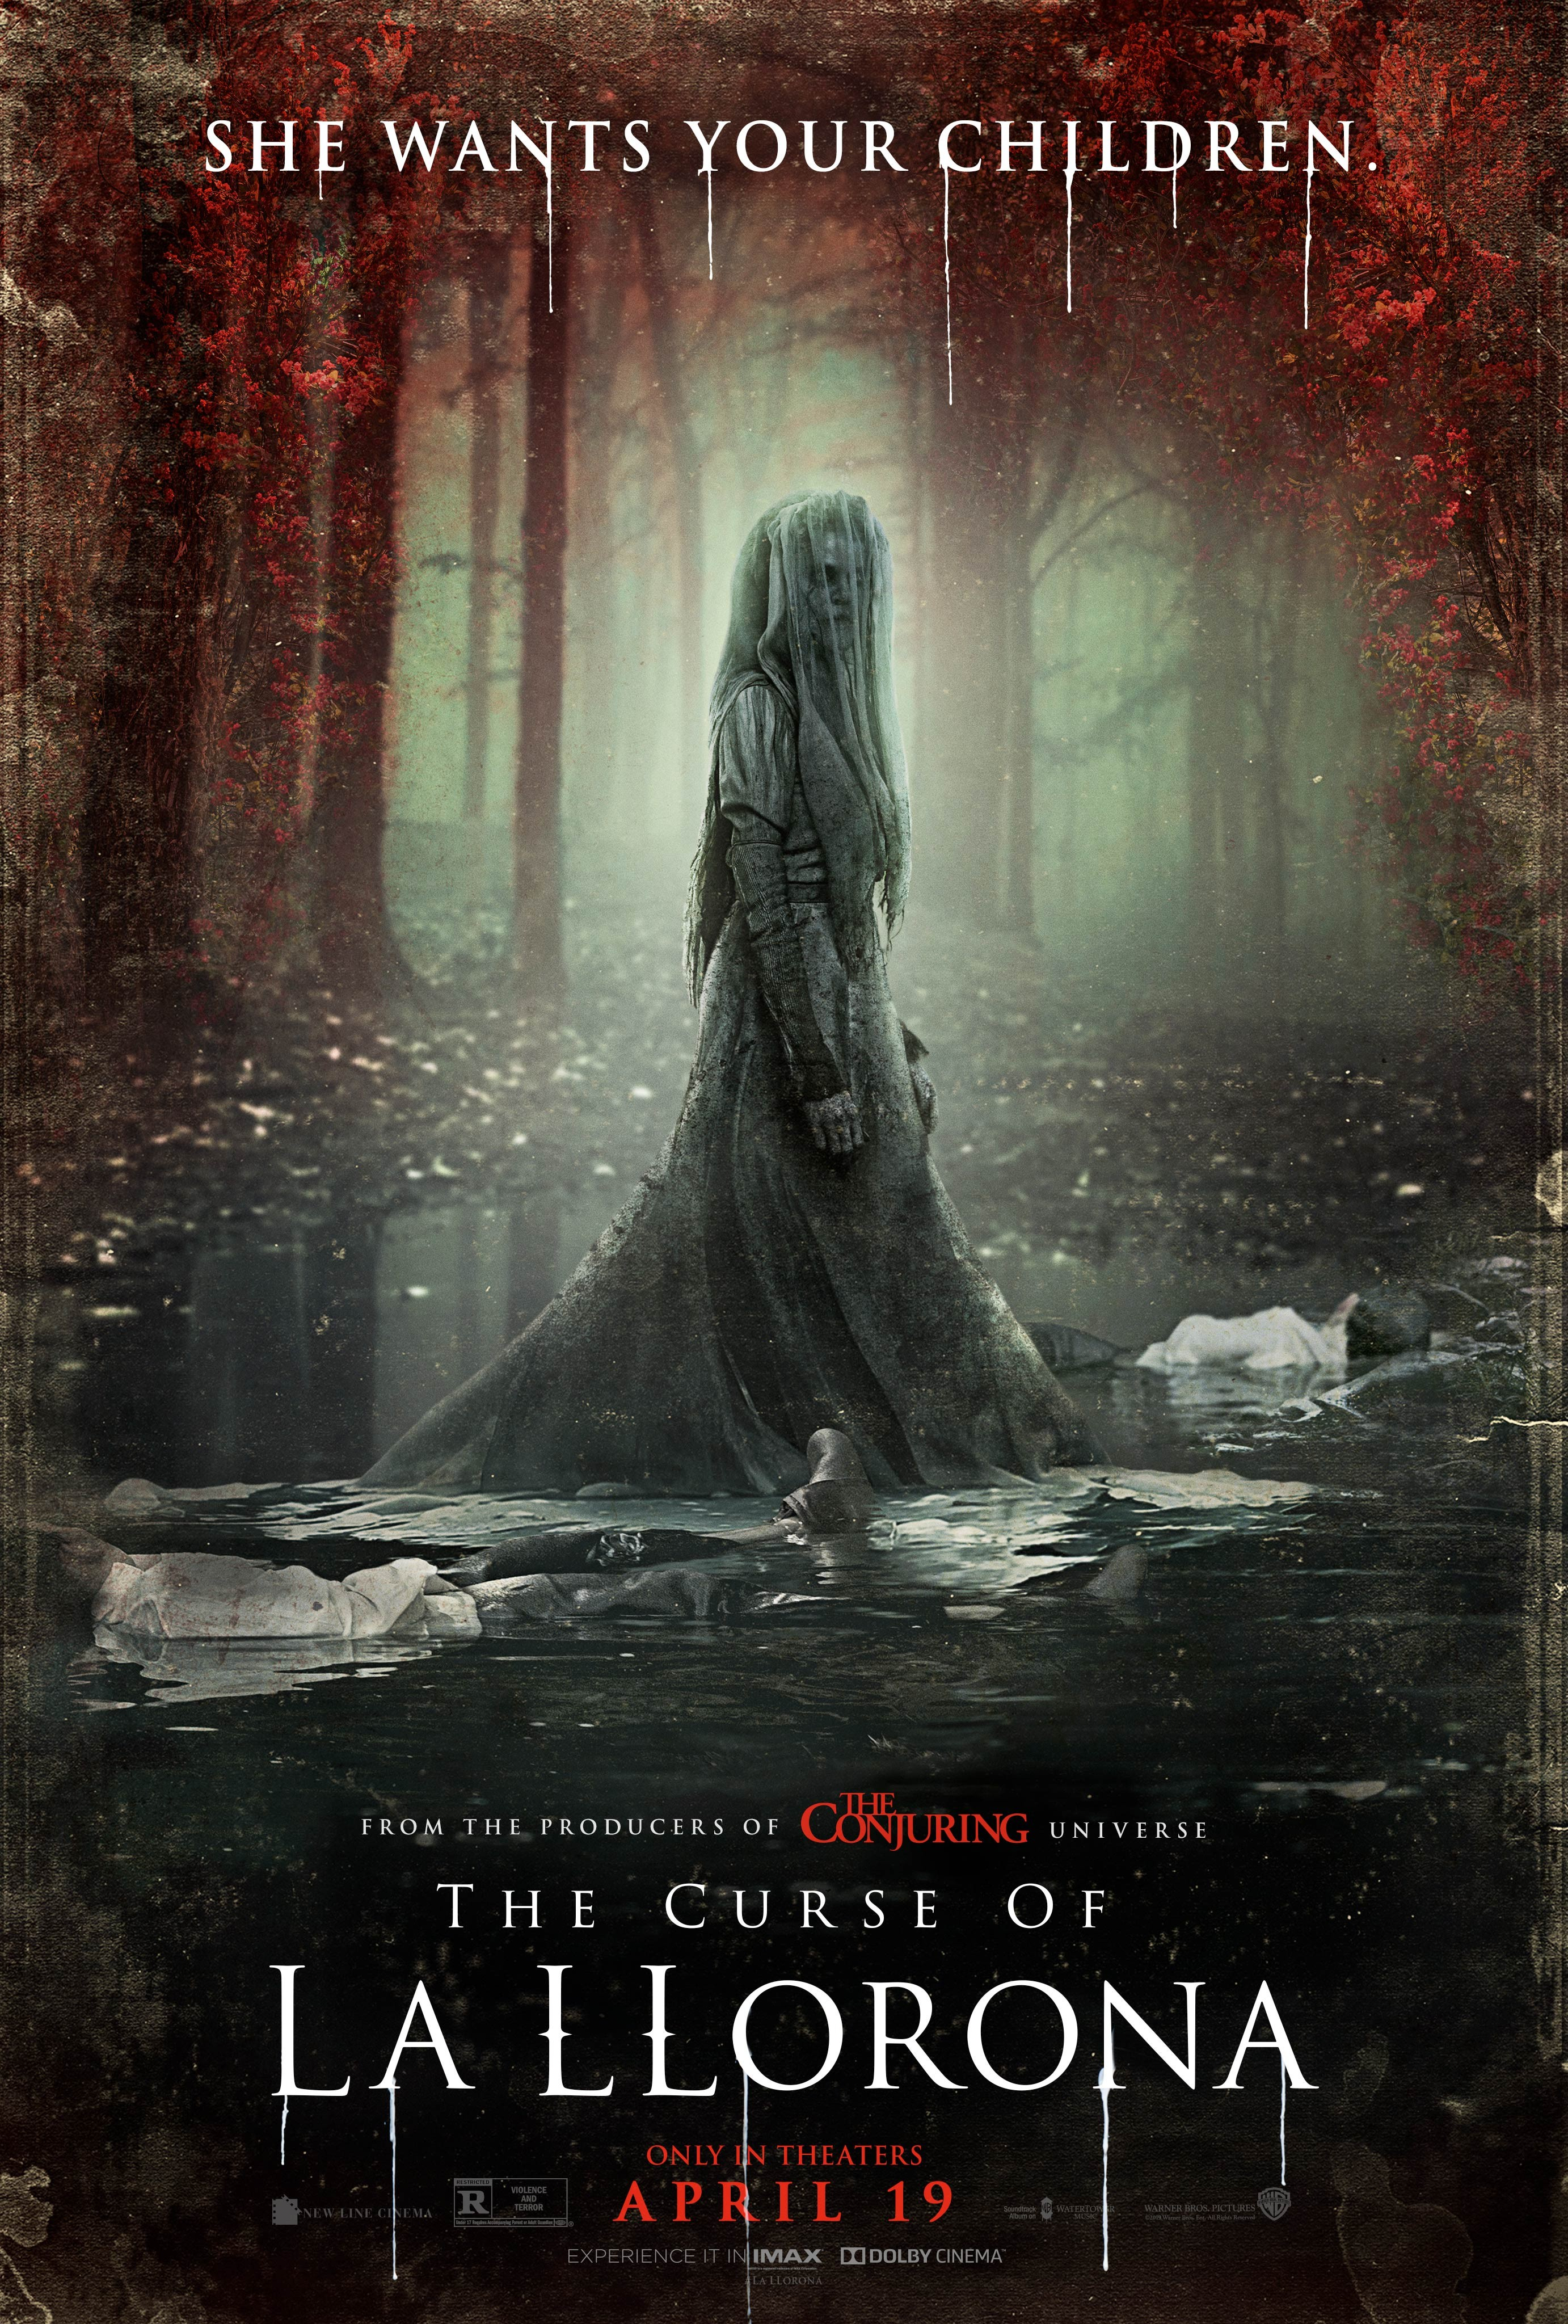 The Curse Of La Llorona 2019 Rotten Tomatoes